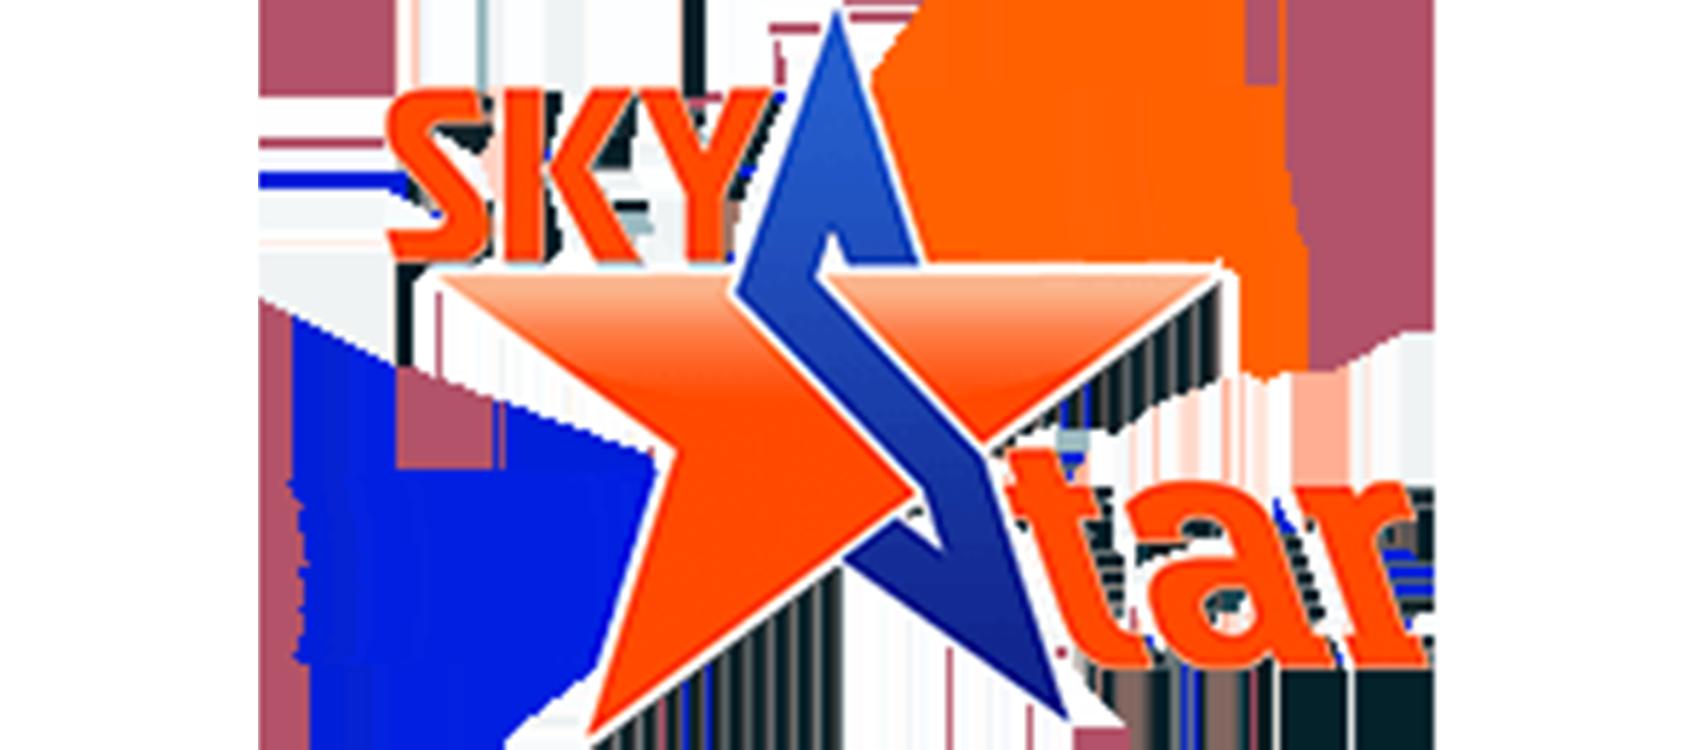 SkyStar (Донецкая)